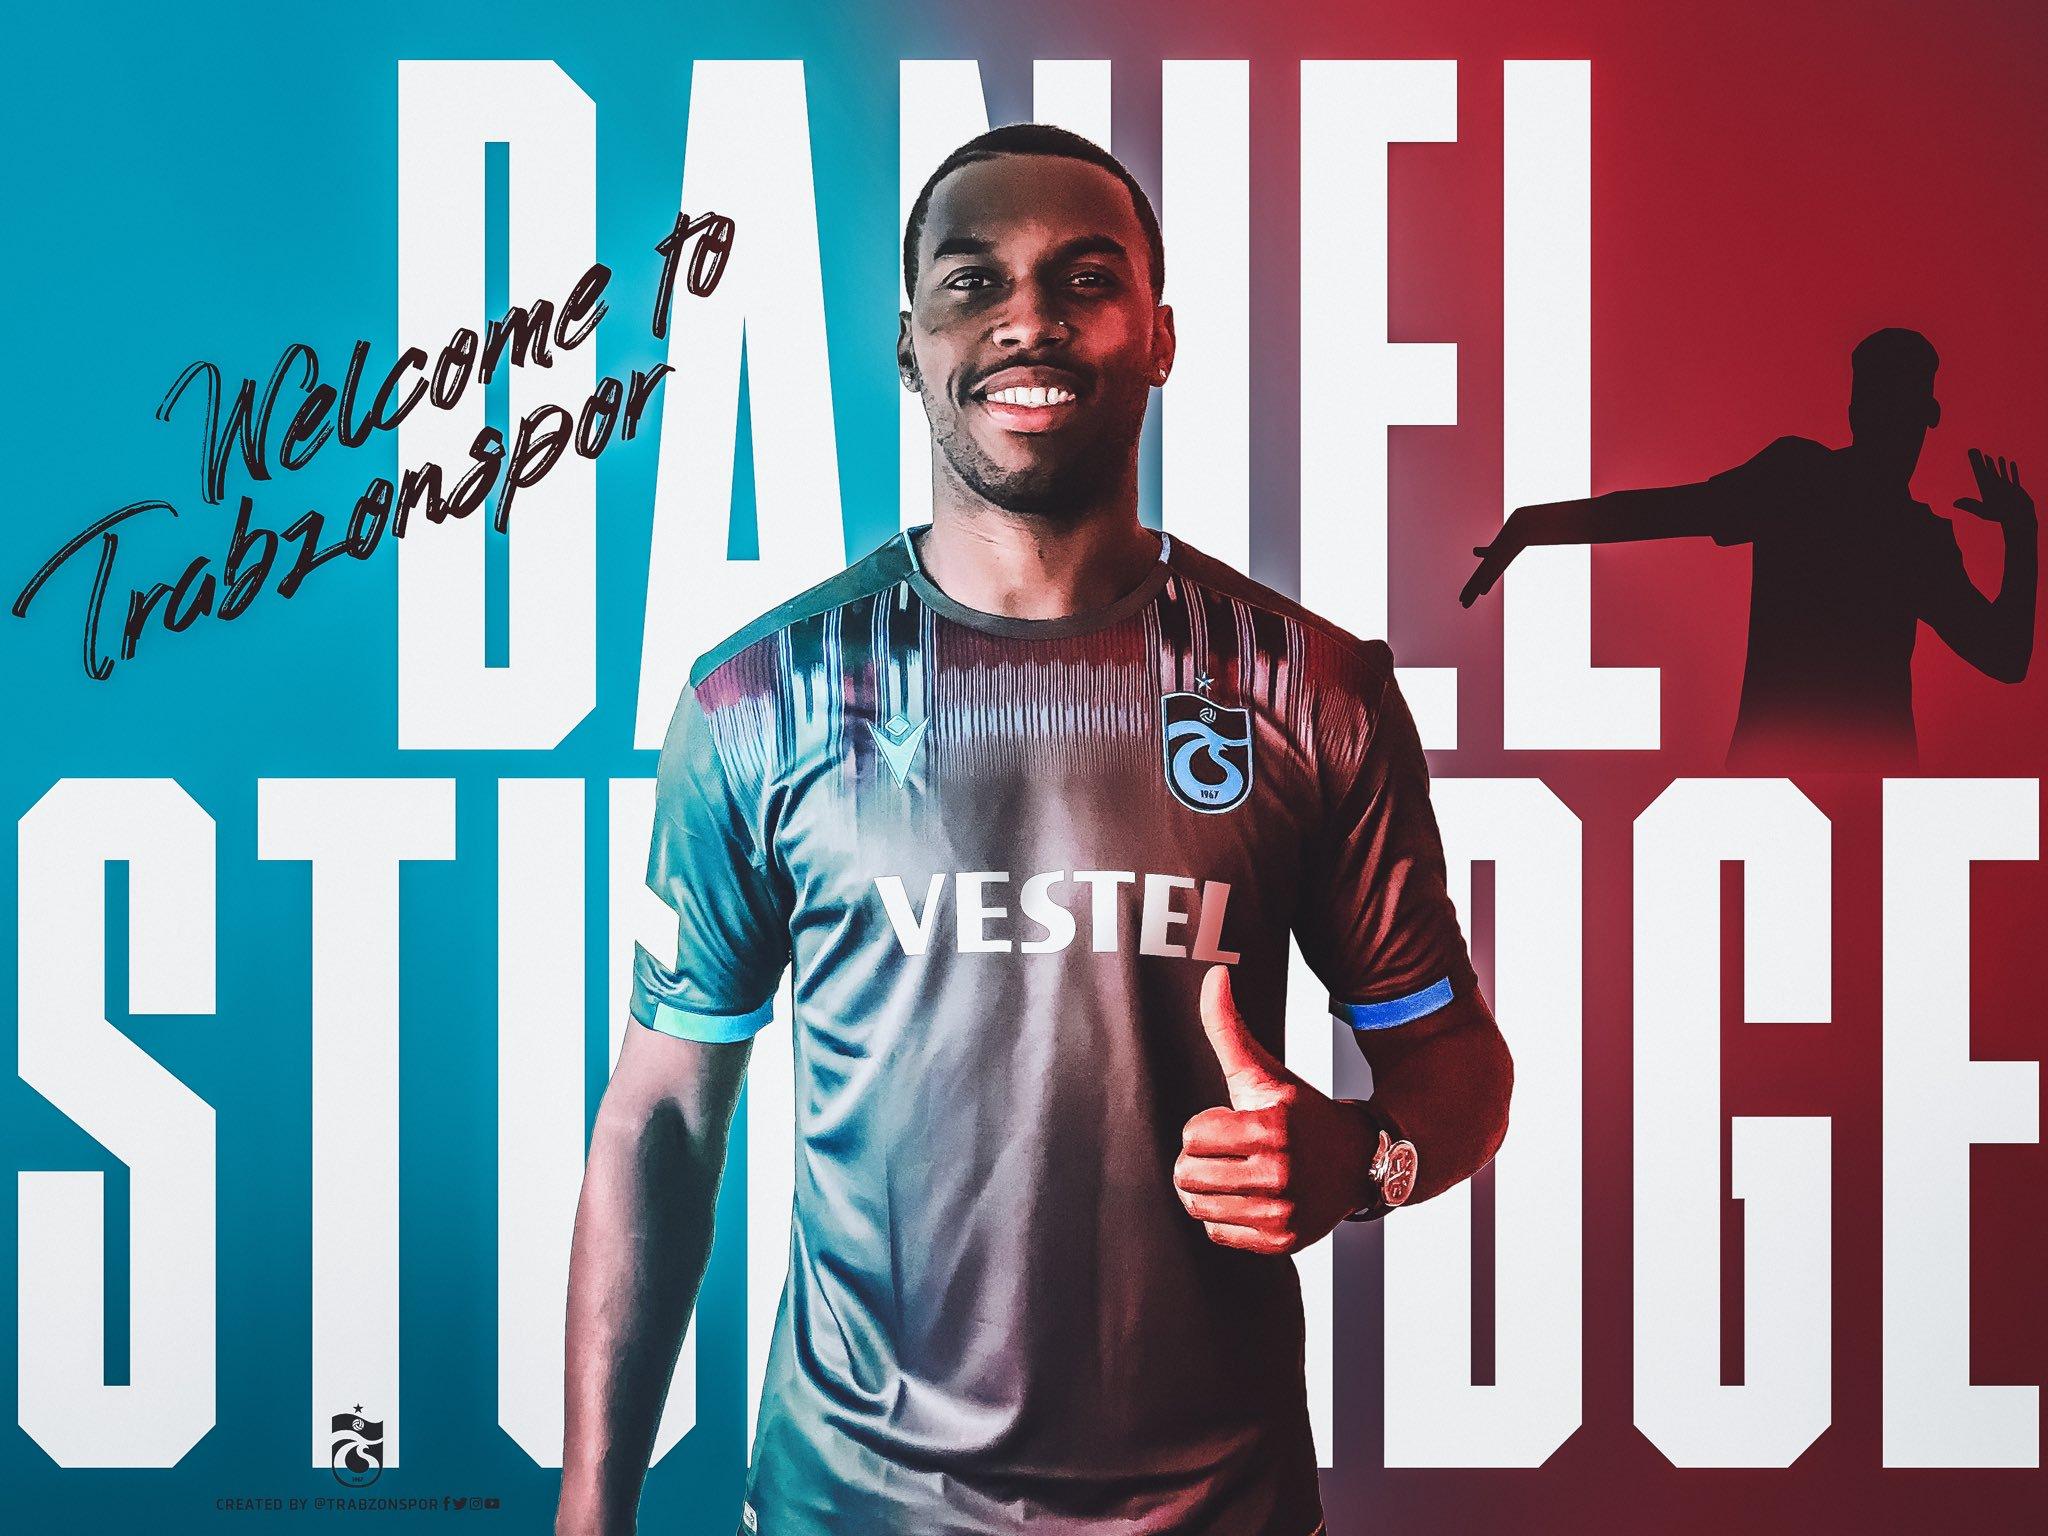 Daniel Sturridge joins Trabzonspor on three-year deal after Liverpool exit - Bóng Đá